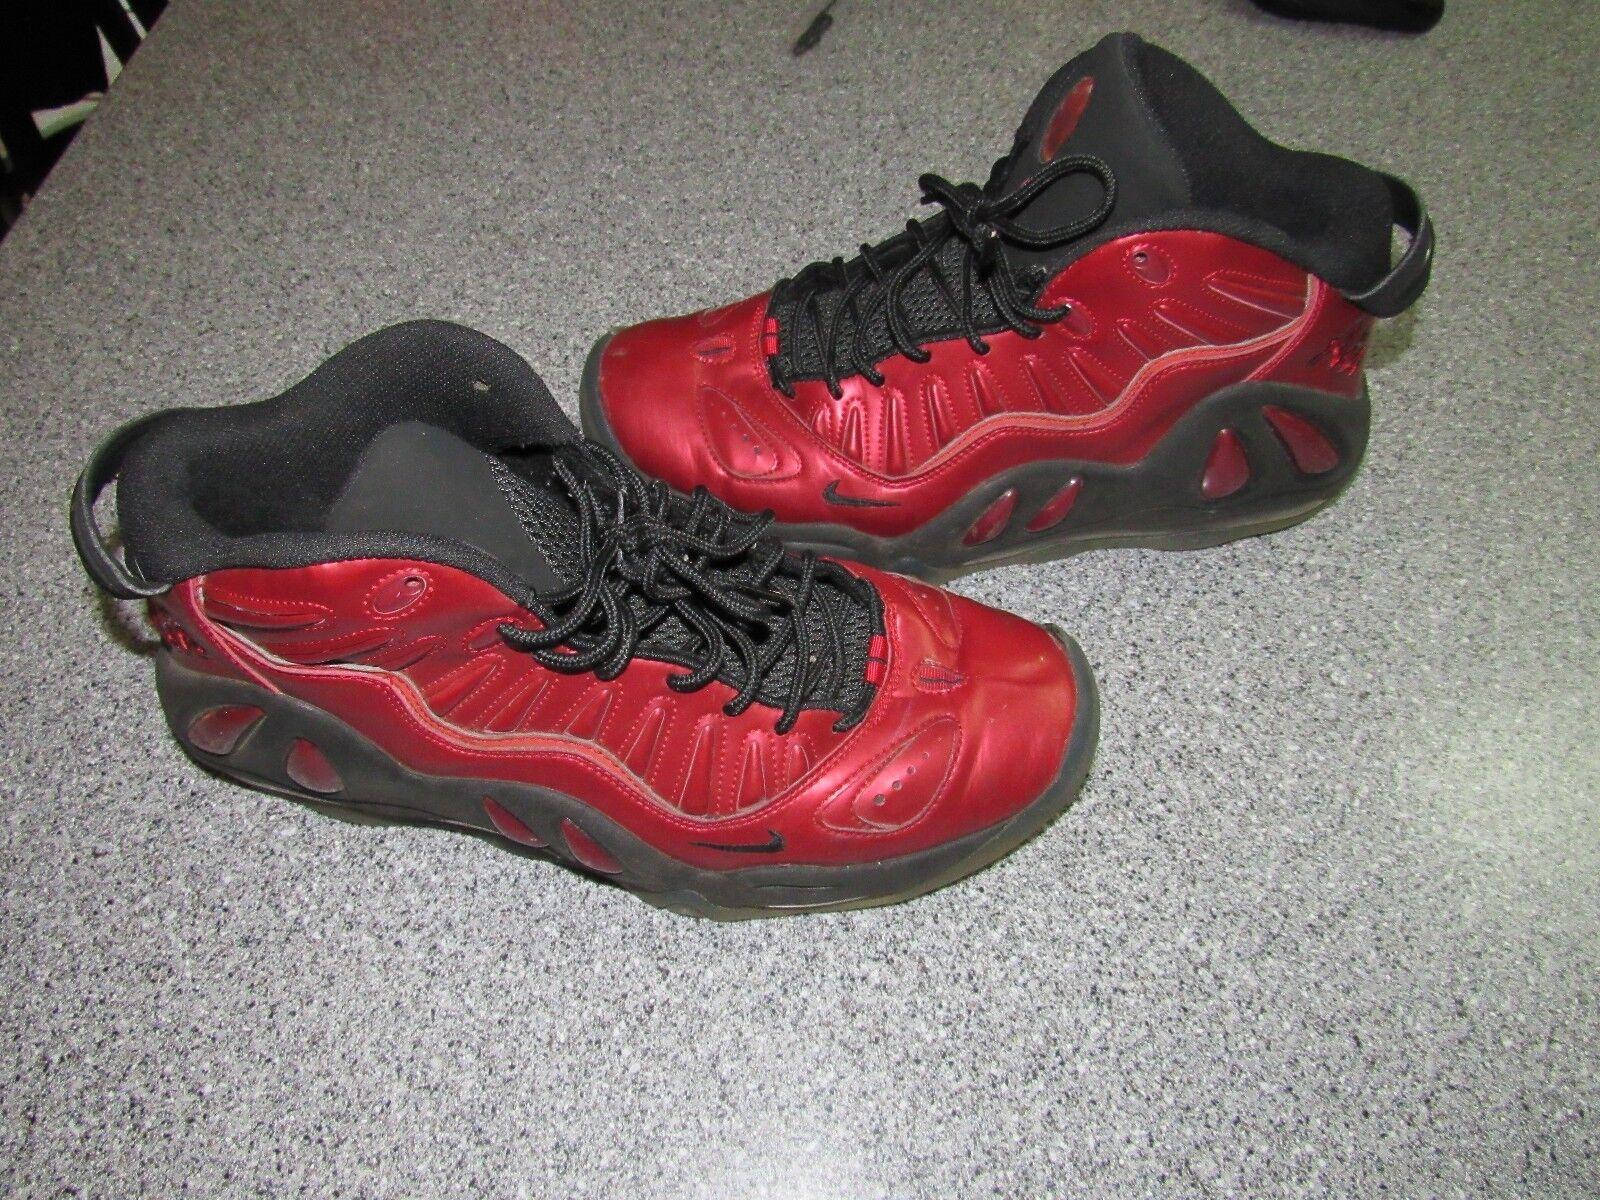 les chaussures shox 8,5 basket nike taille 8,5 shox e16c3a